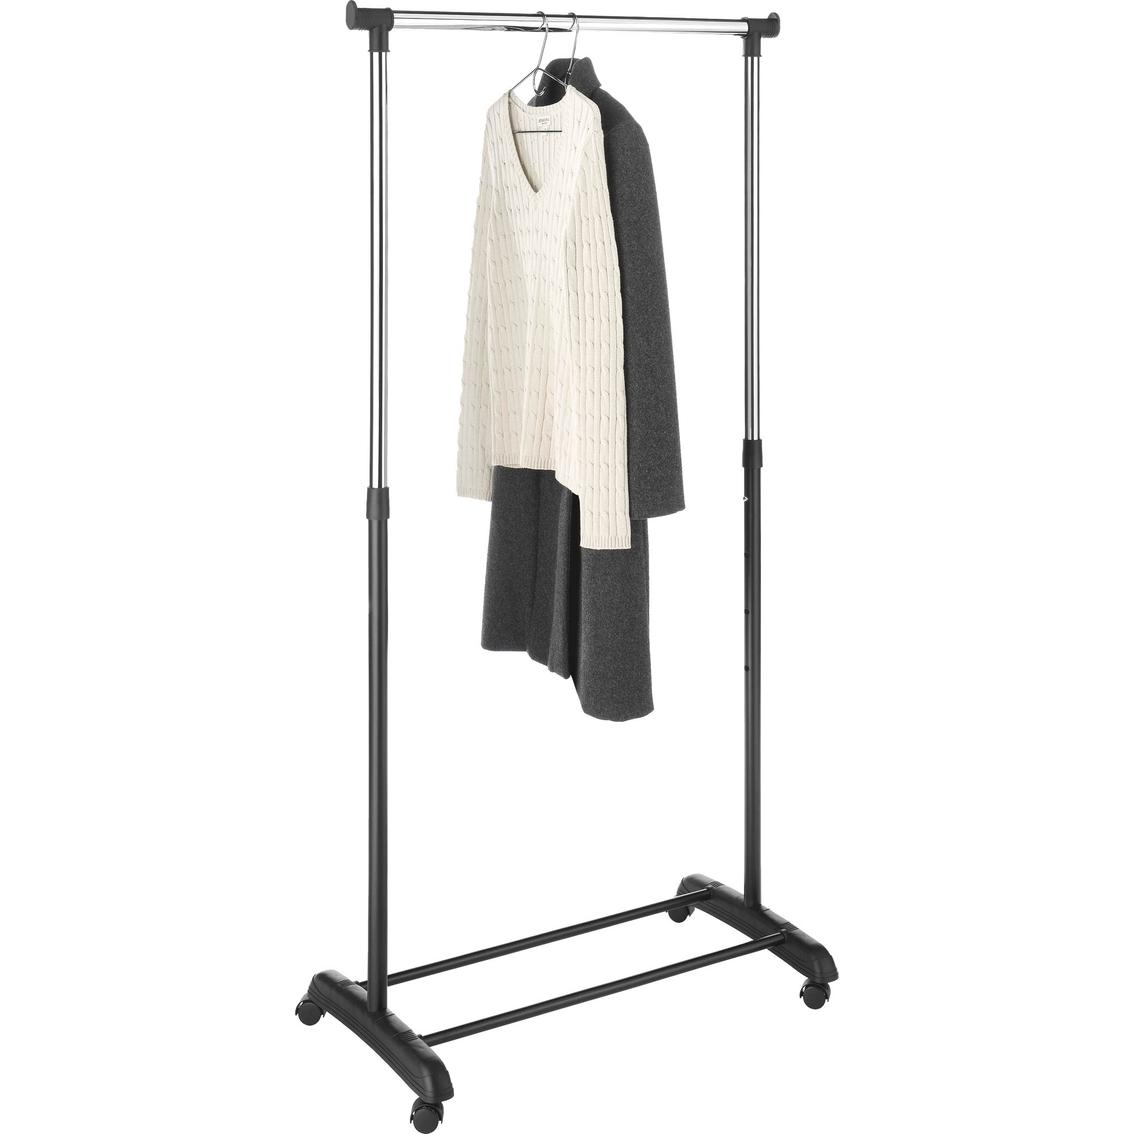 Whitmor Adjustable Garment Rack